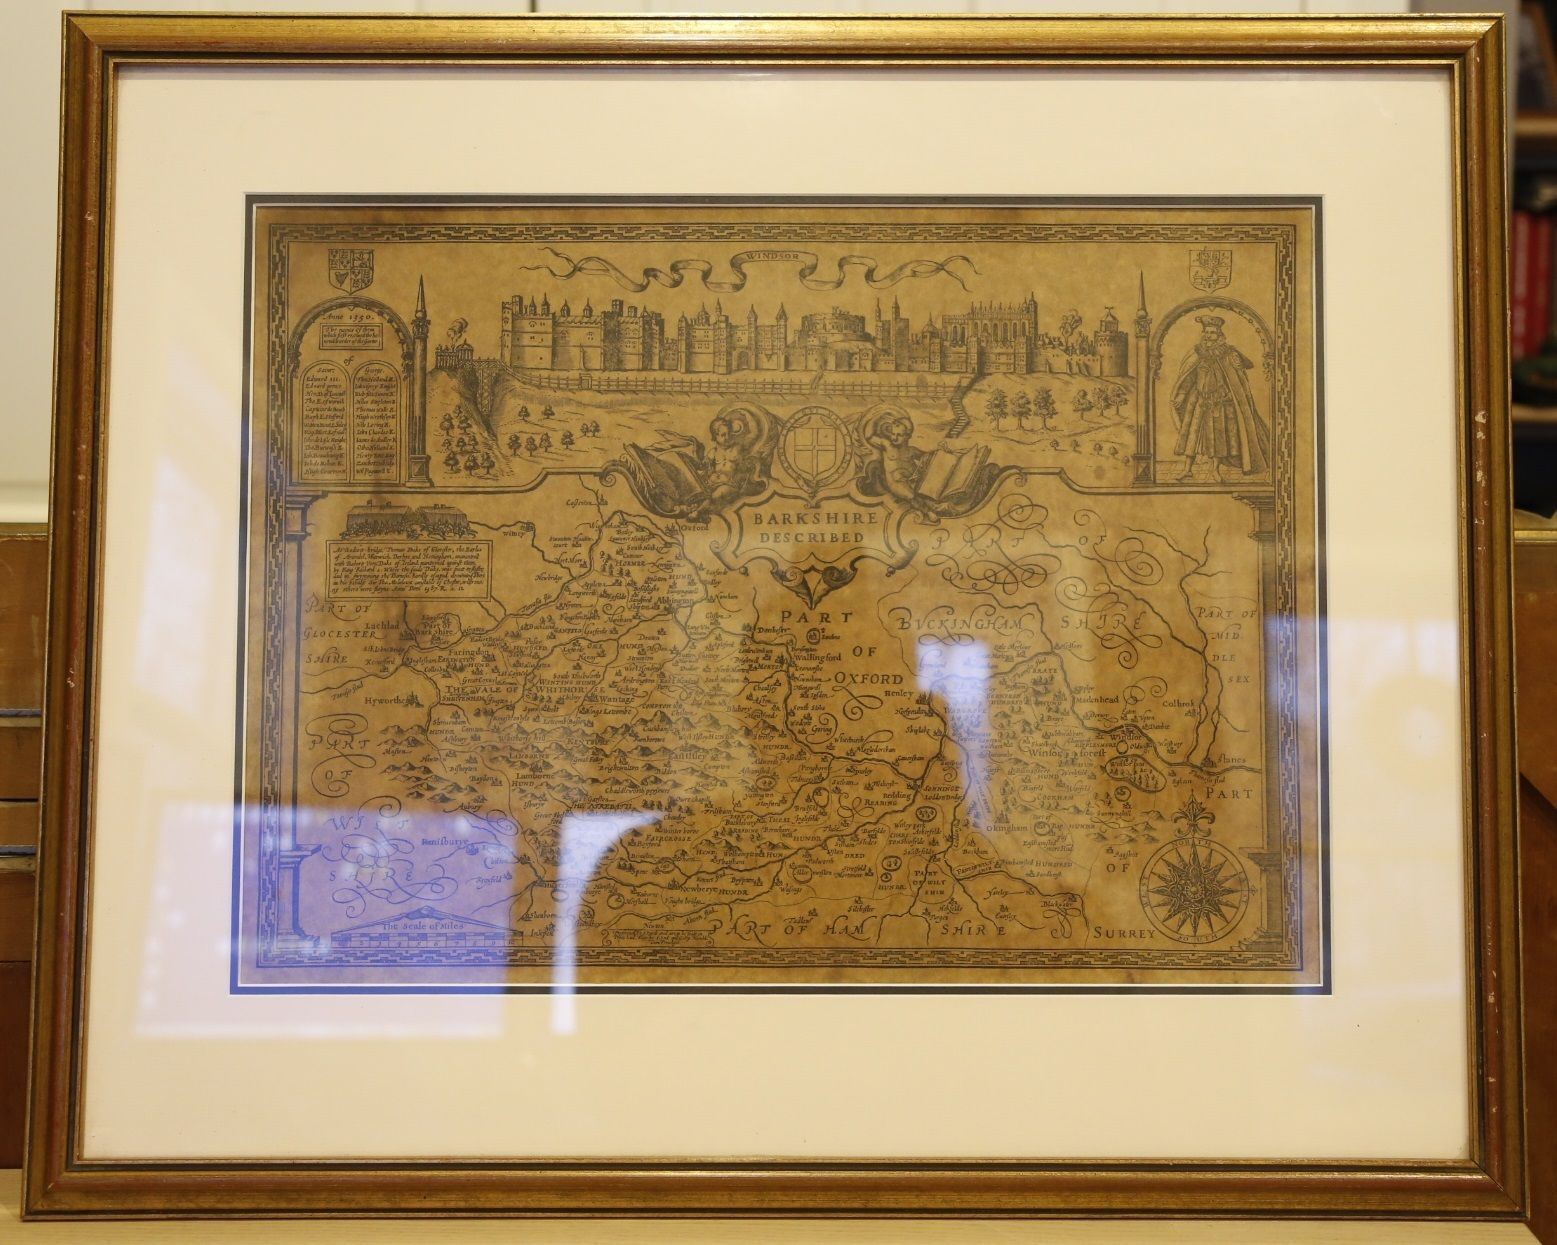 John Speed Map - Barkshire Described